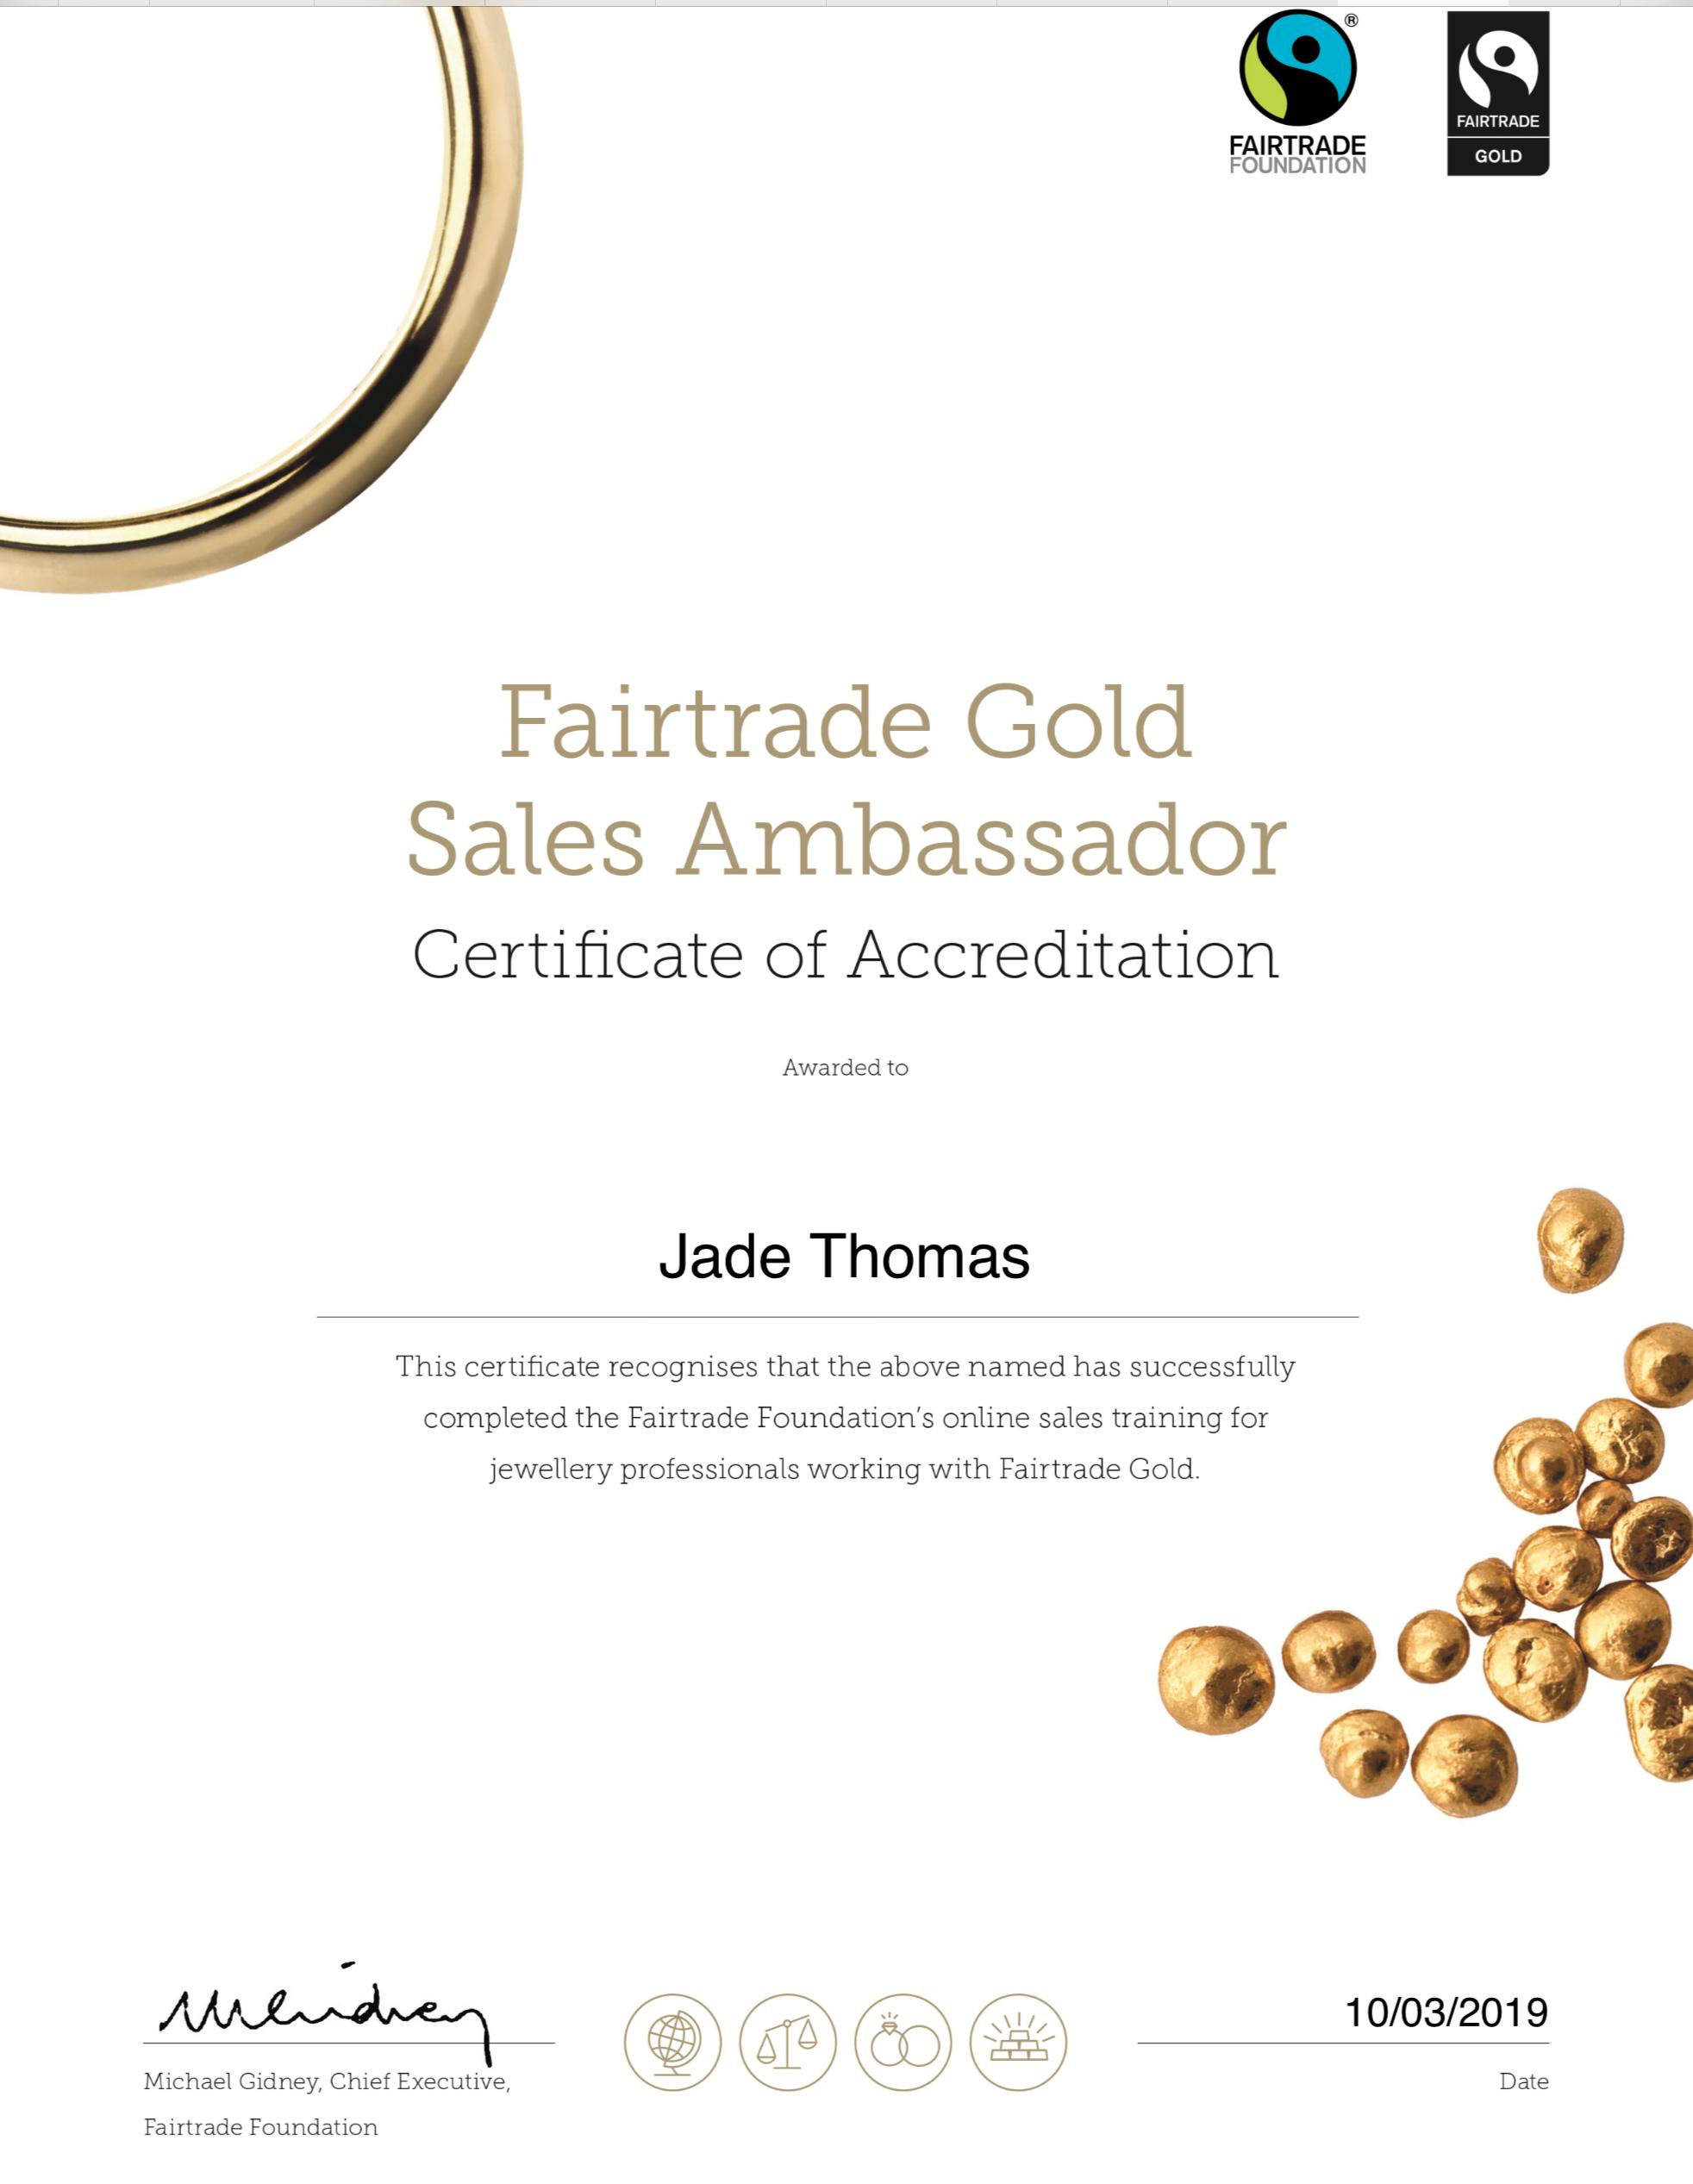 fairtrade-ambassador.jpg